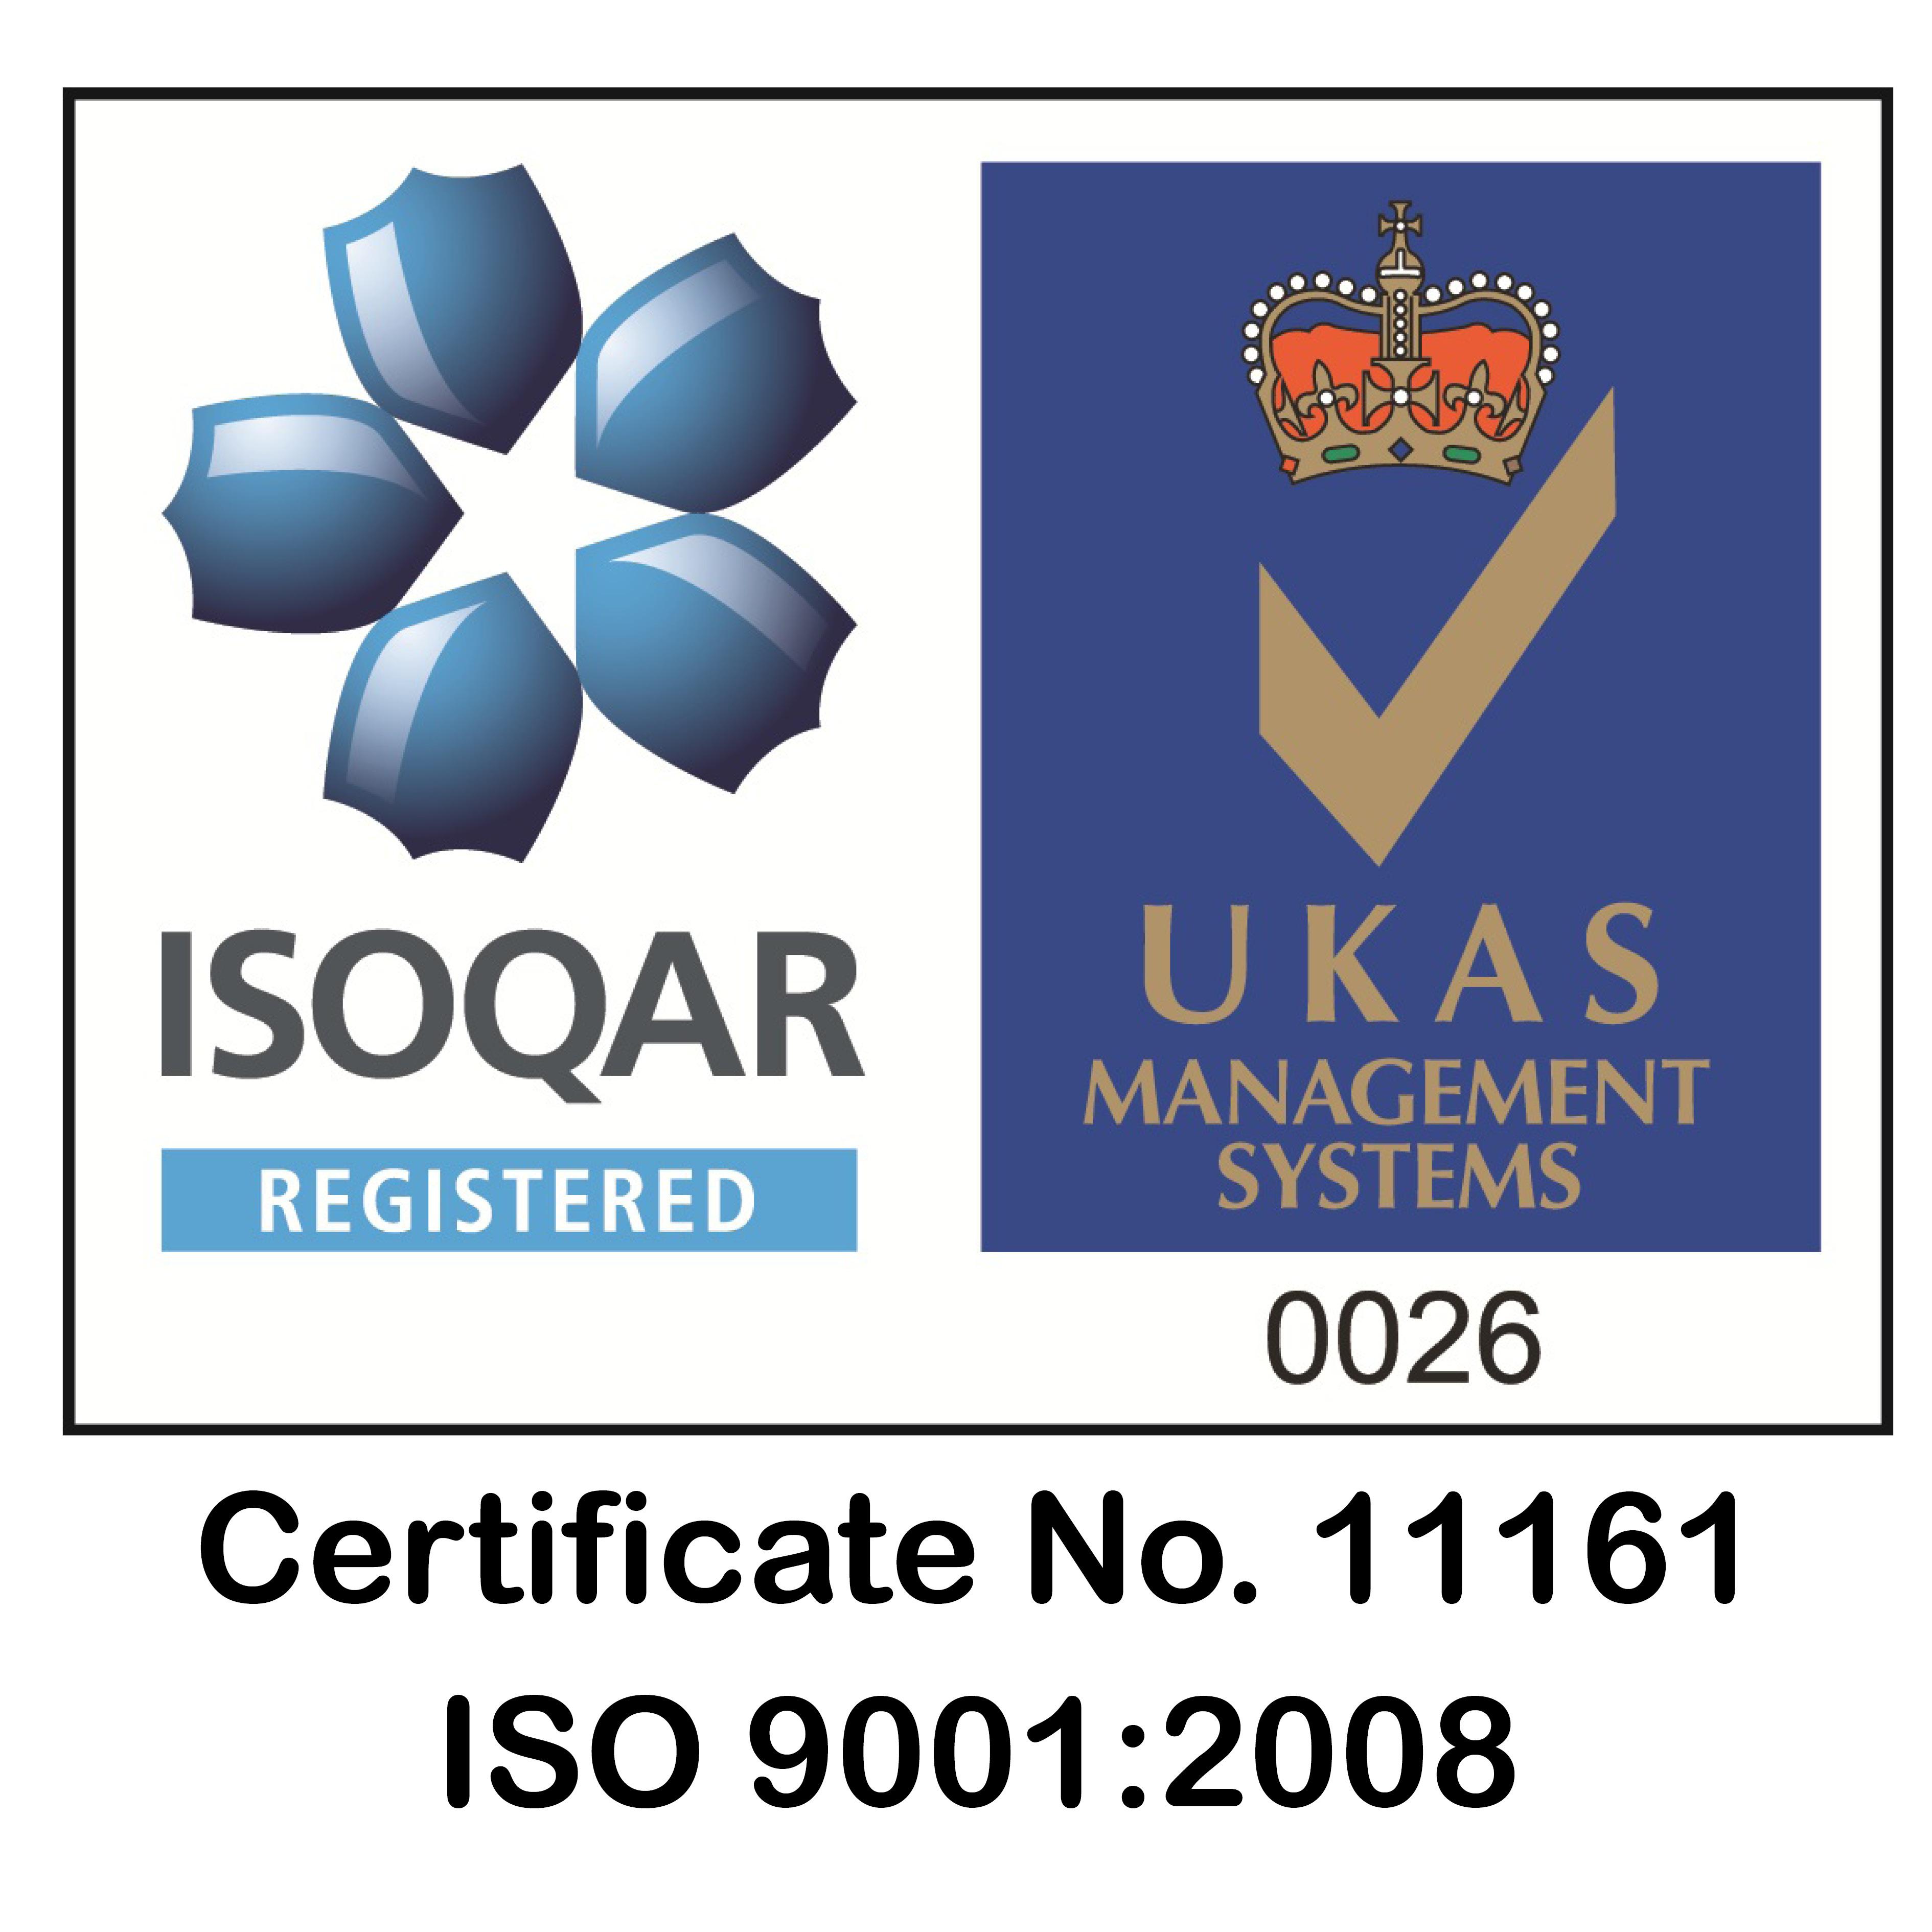 UKAS ISOQAR LOGO 9001